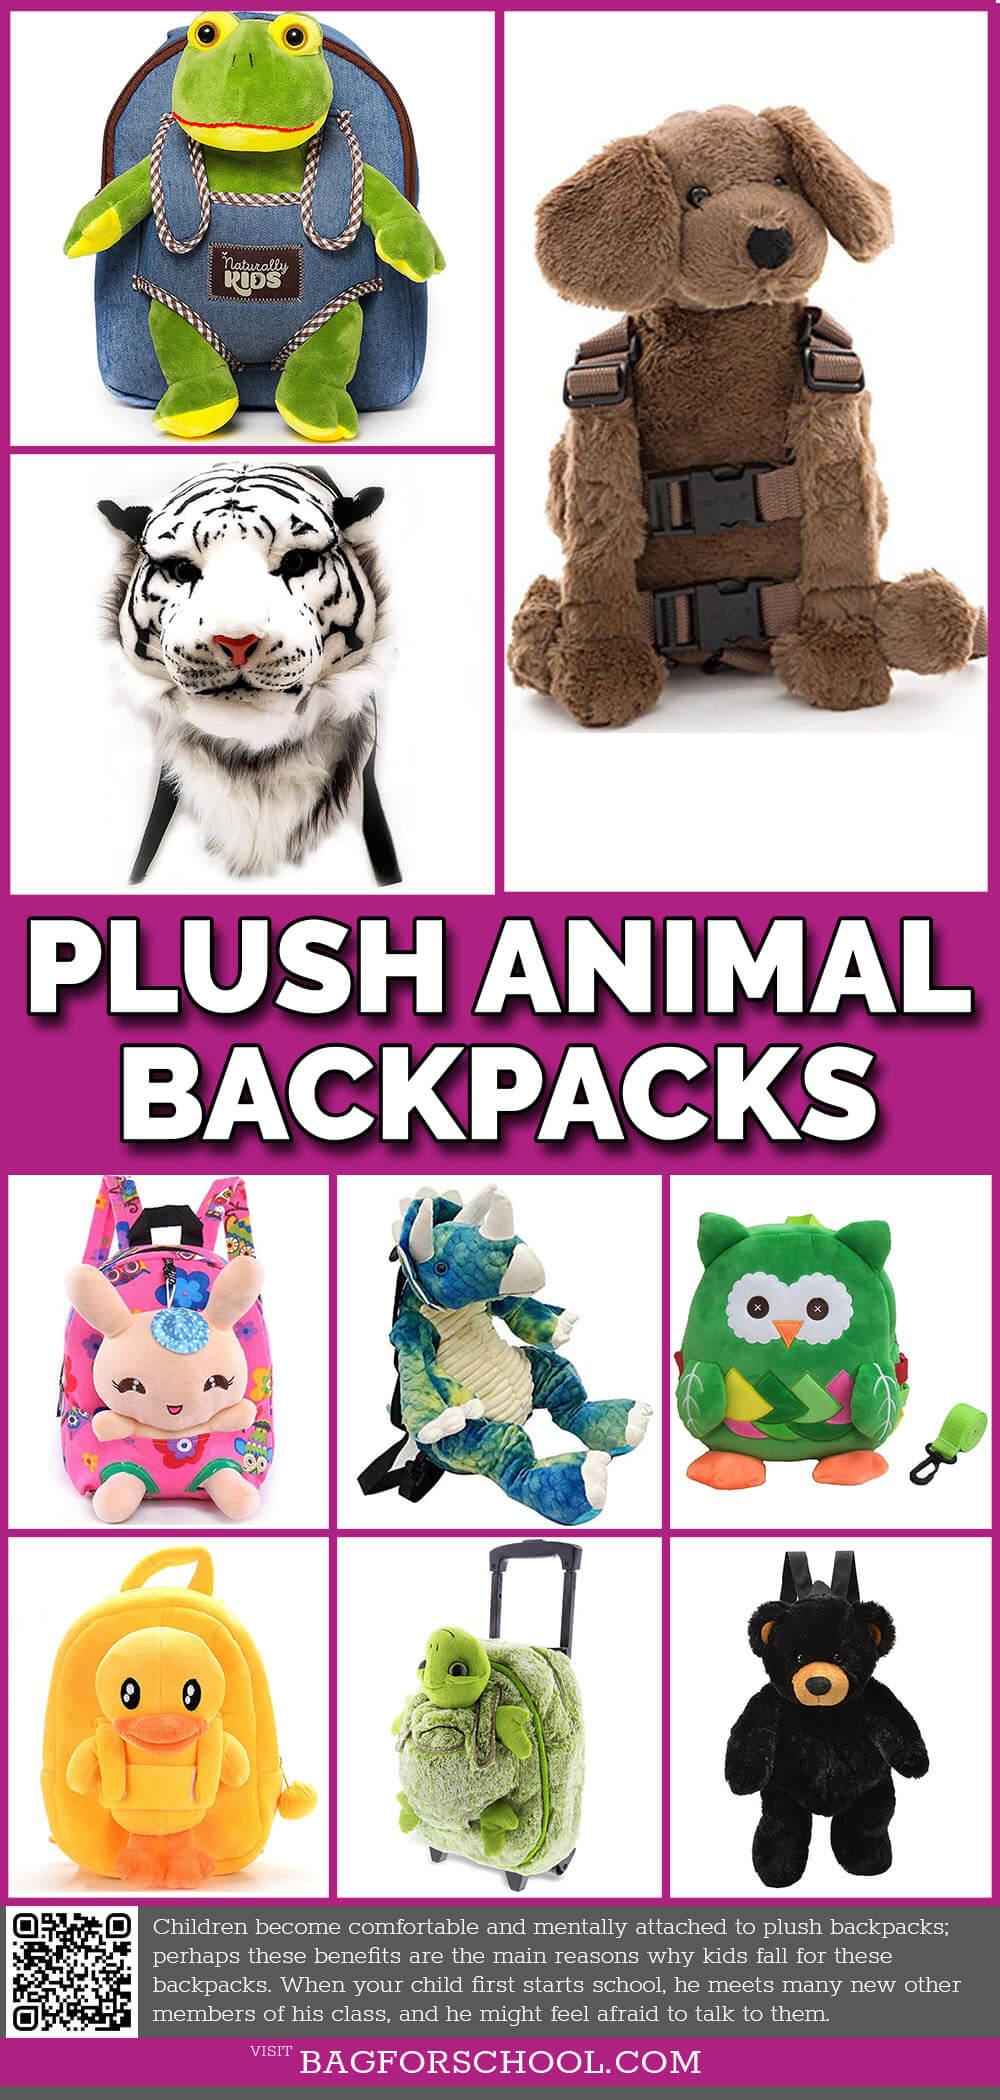 Plush Animal Backpacks